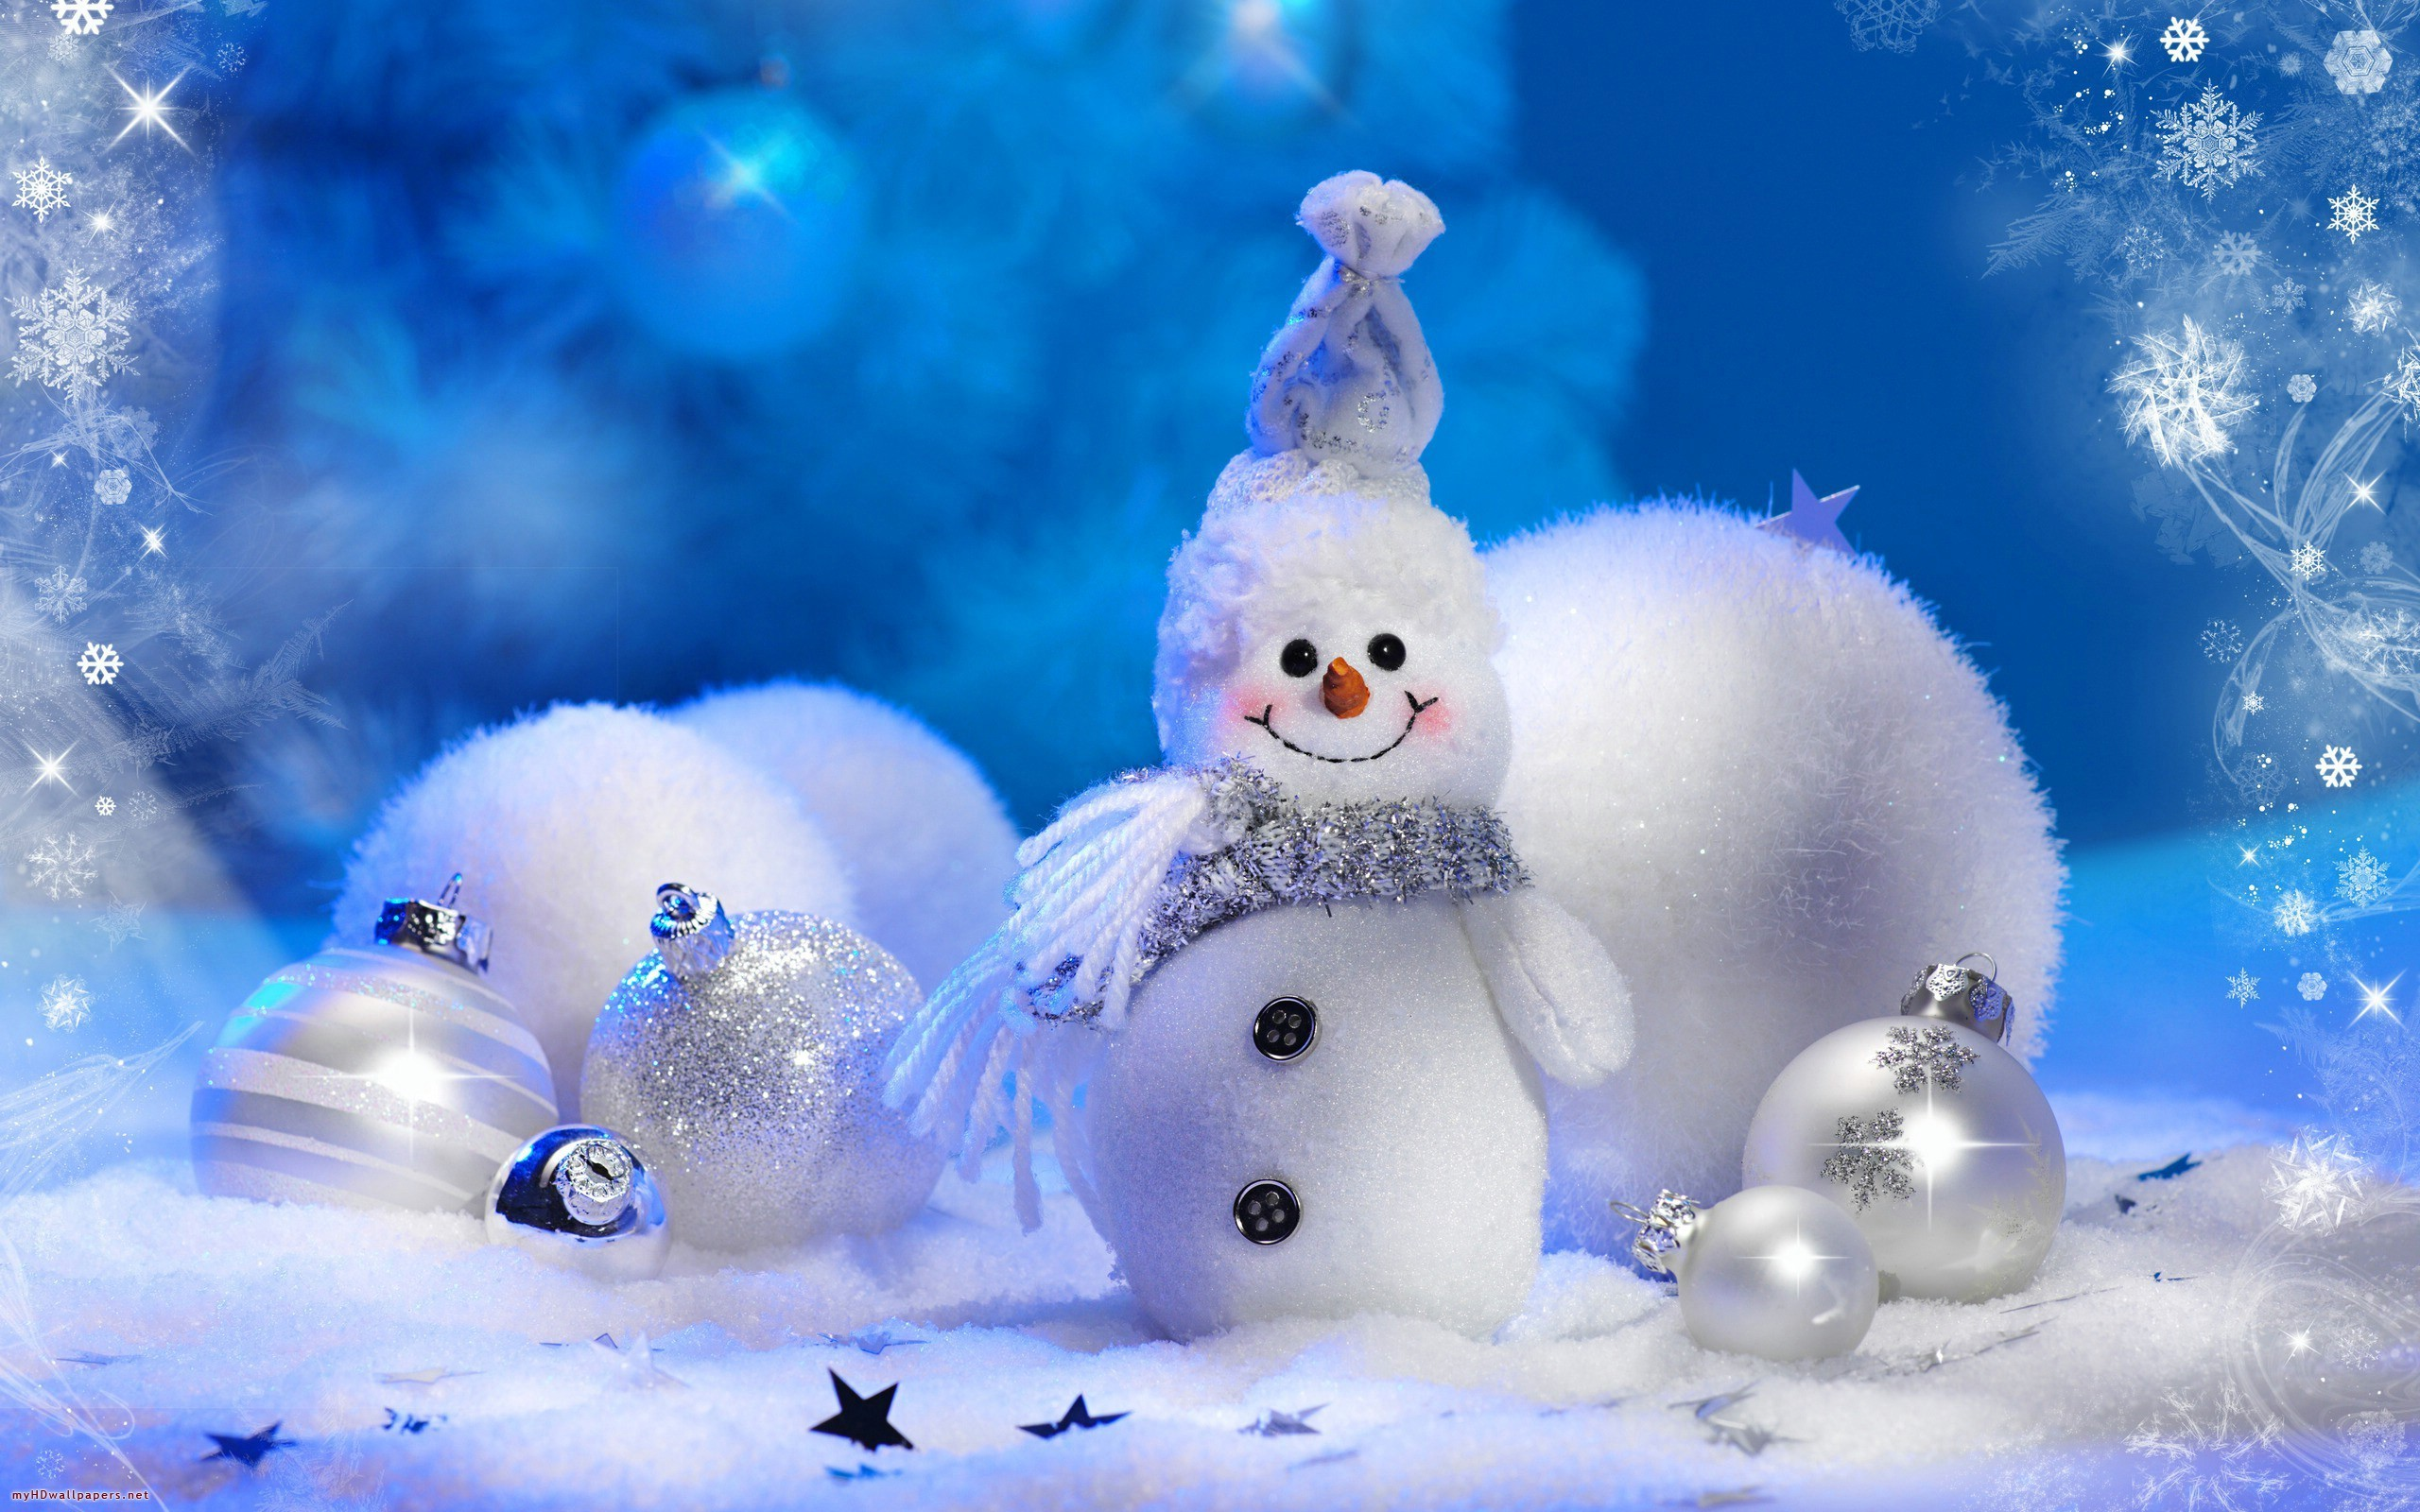 Christmas wallpaper hd for desktop - 2560x1600 Disney Christmas Wallpapers Hd Desktop